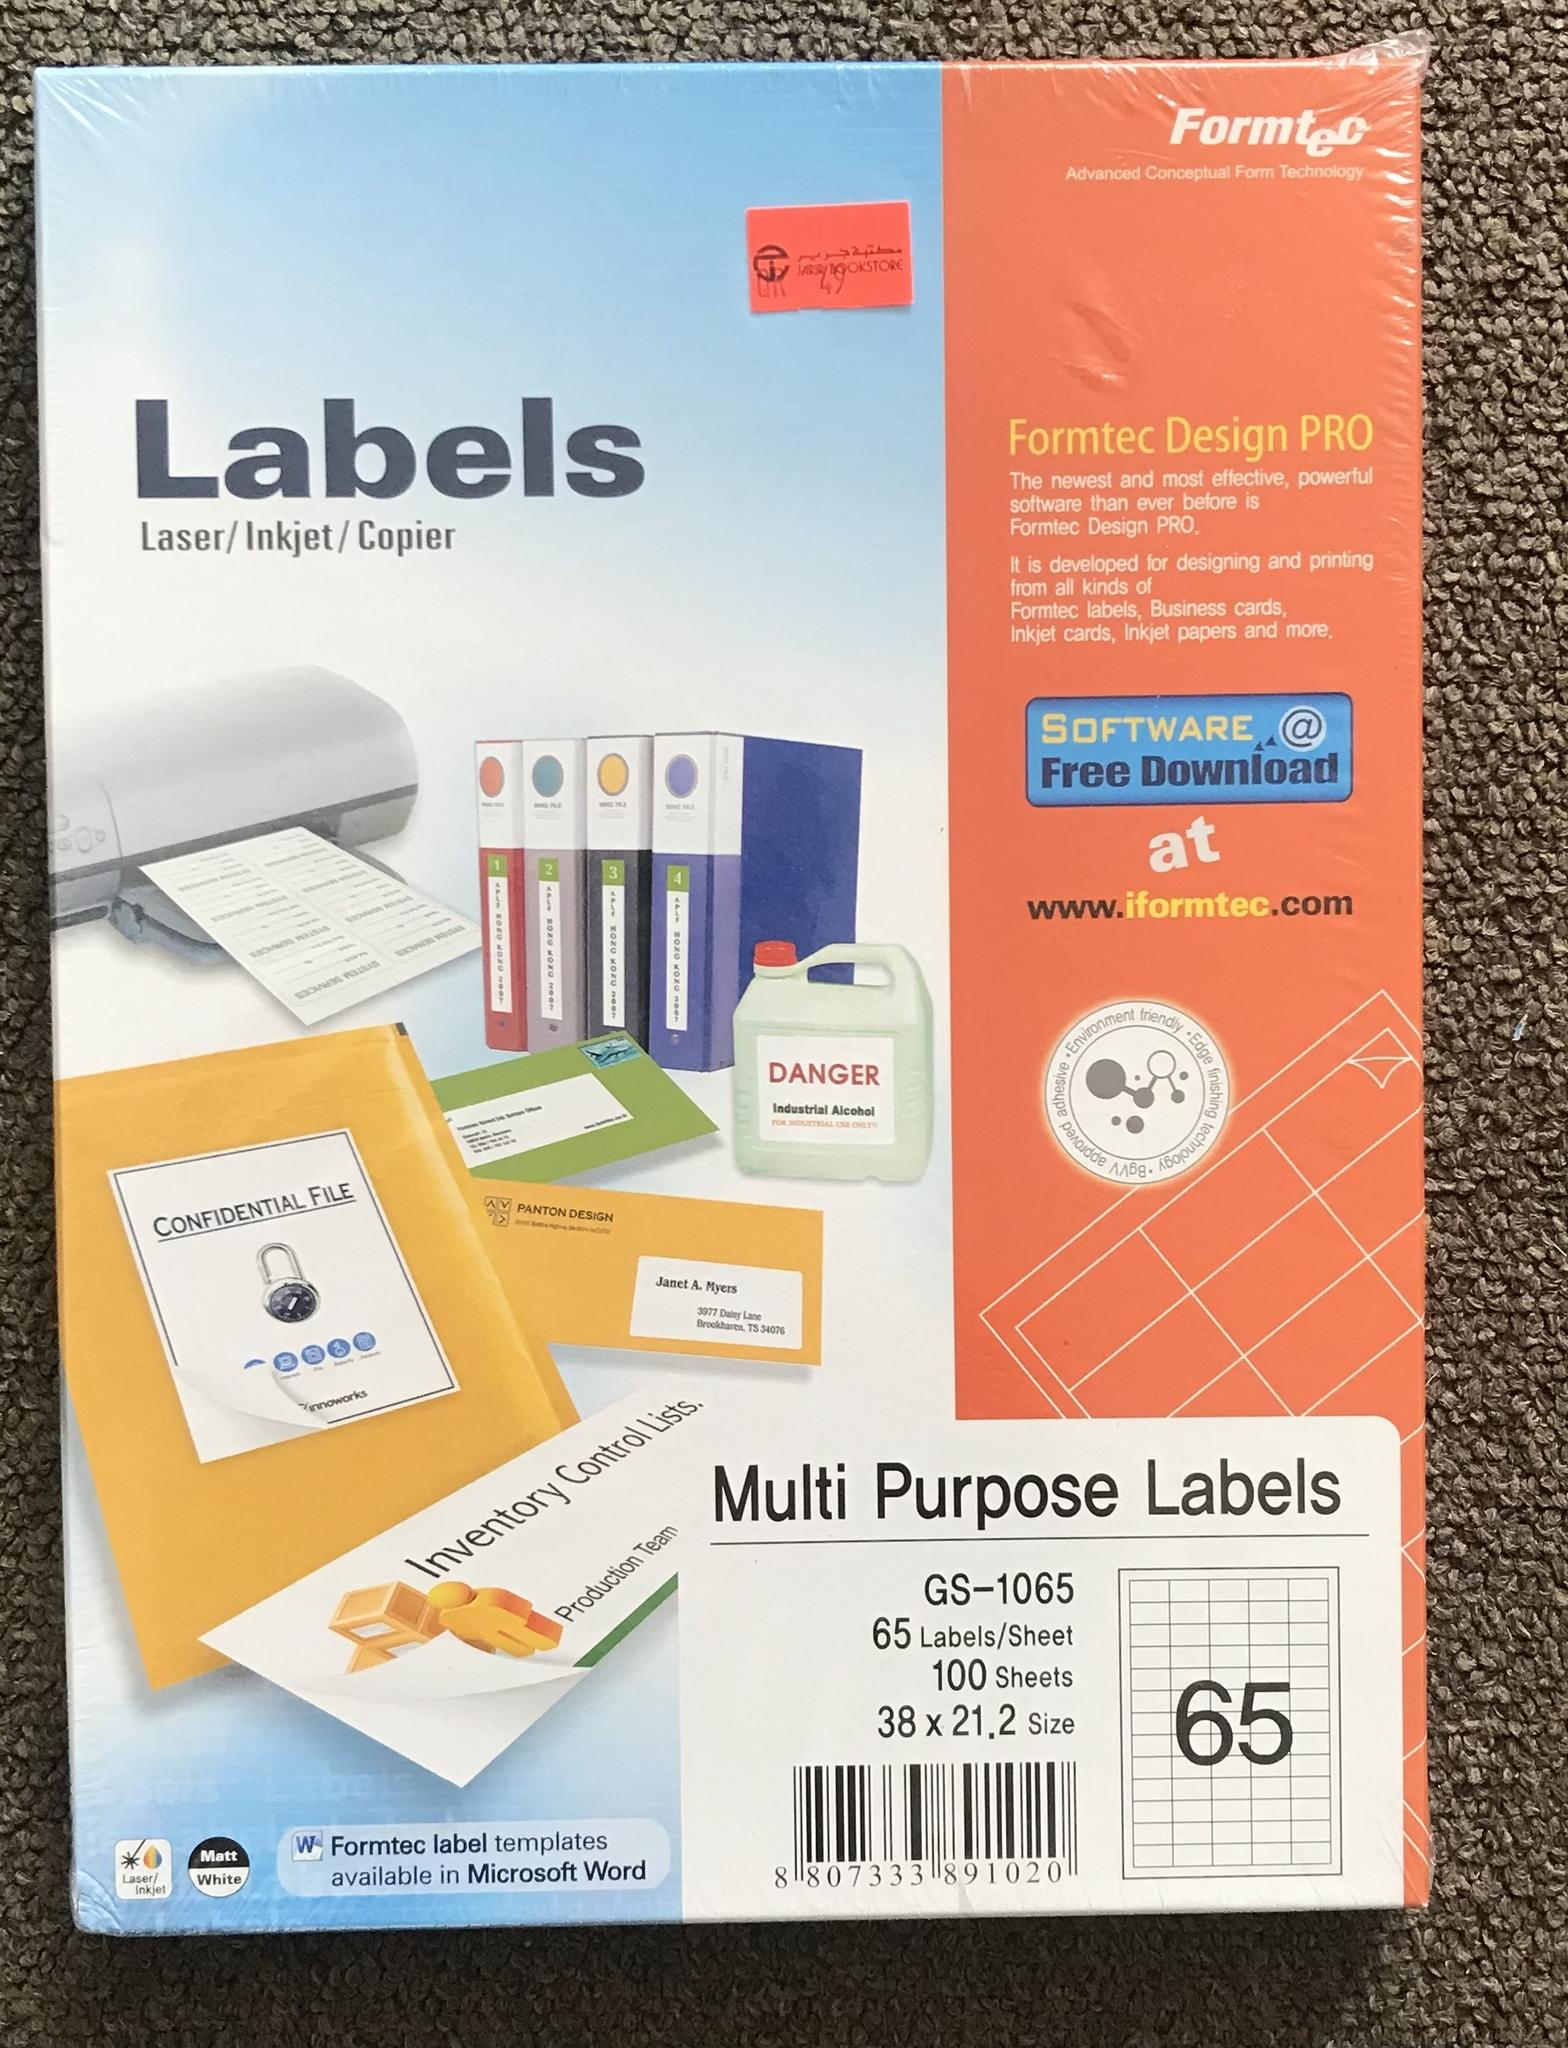 Multi purpose labels